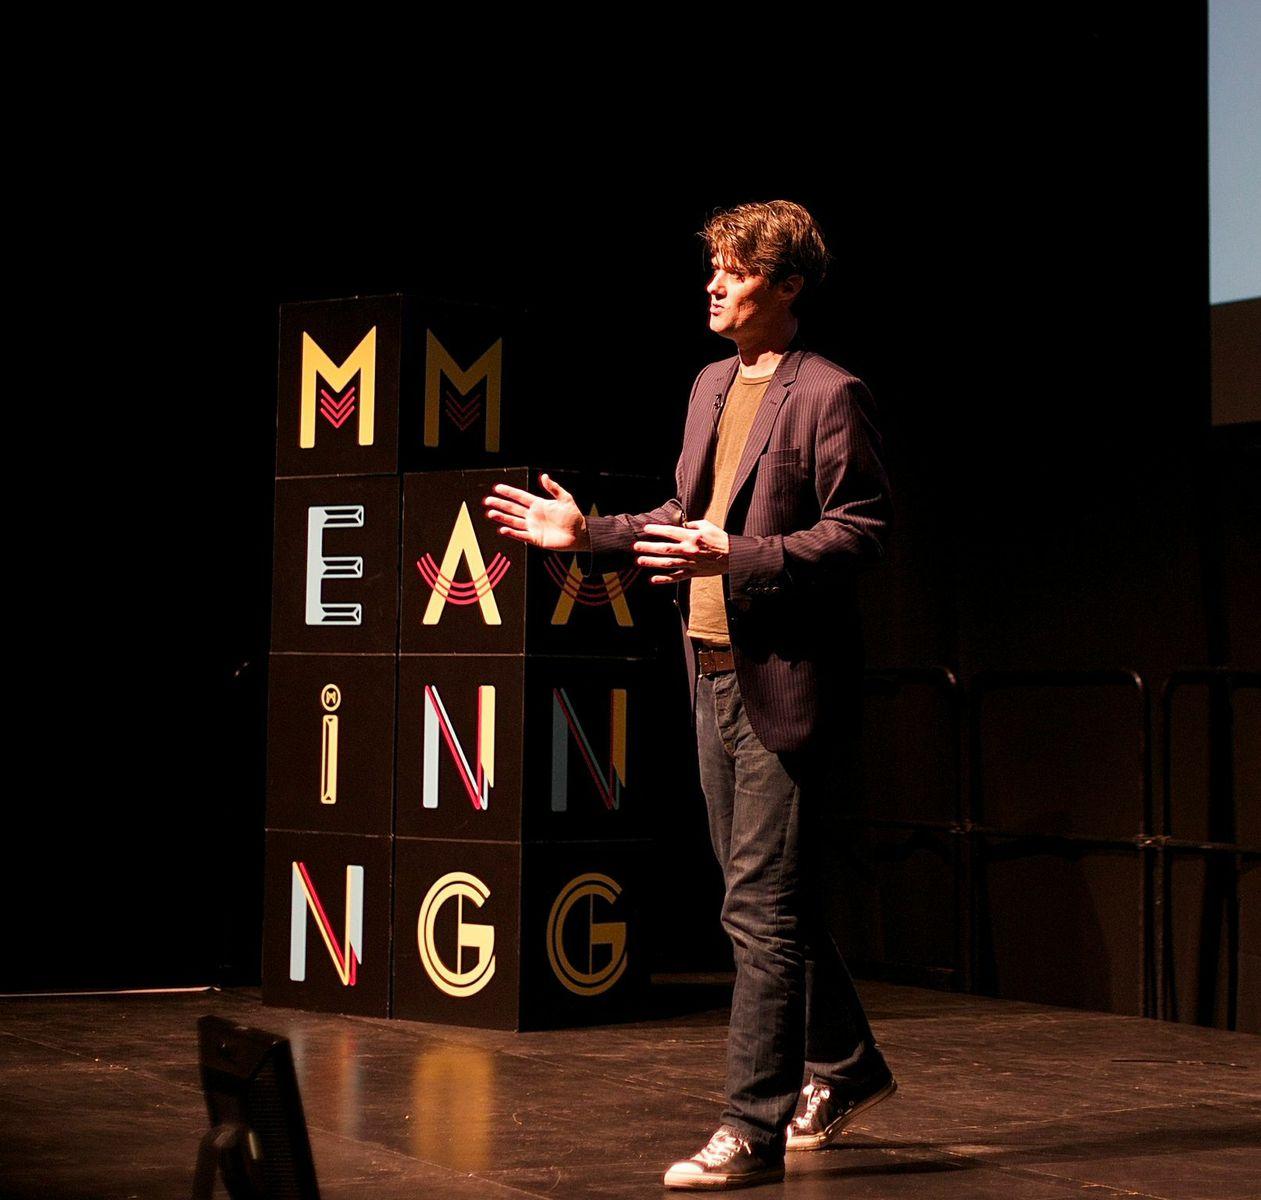 Mark Stevenson Image source: Meaning conference 2014